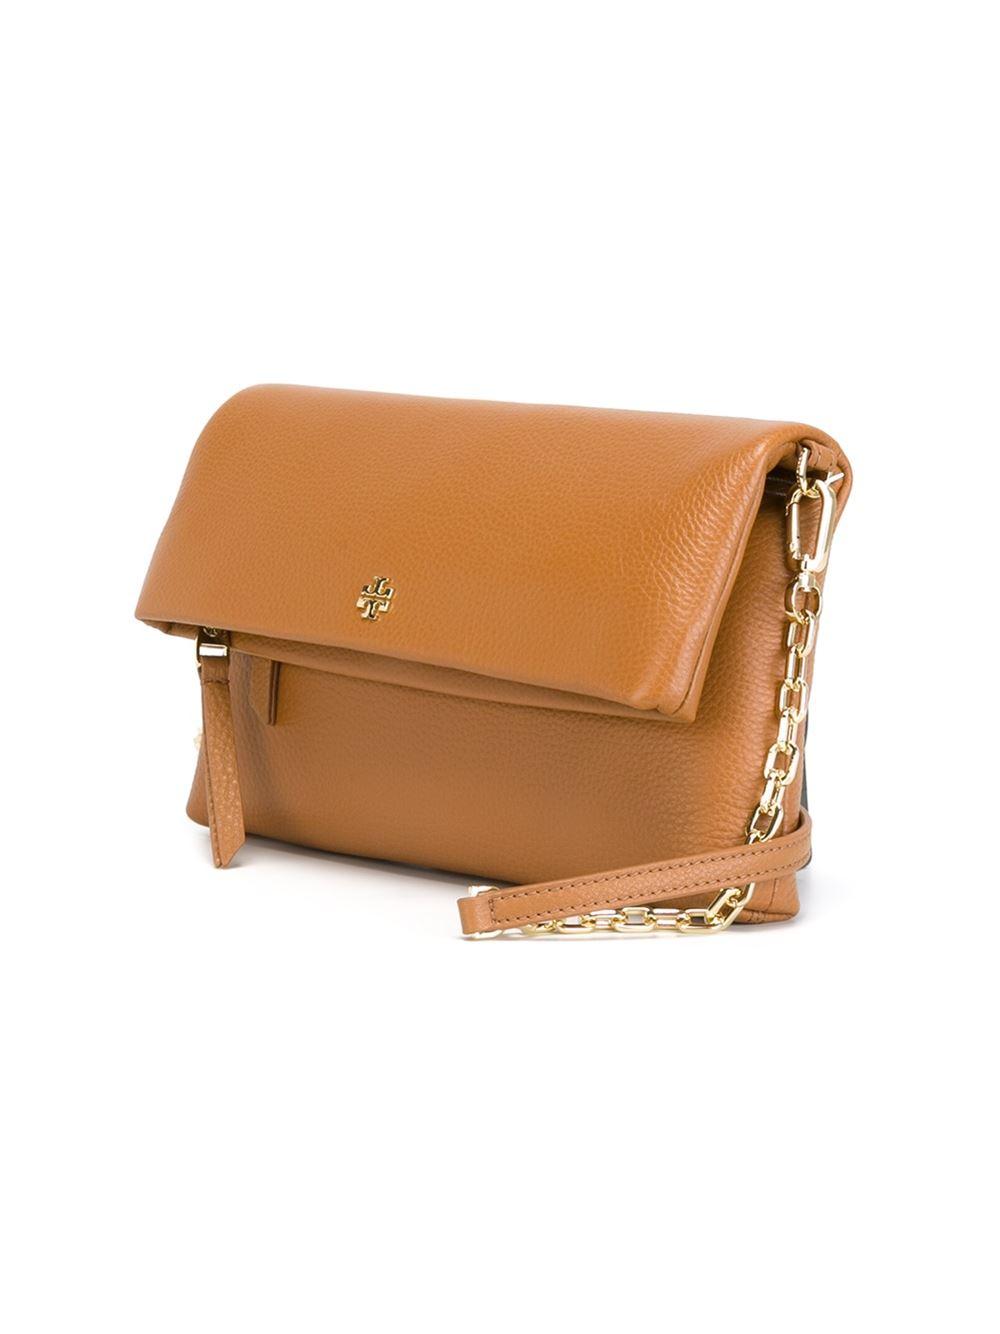 Tory Burch Foldover Shoulder Bag In Beige Brown Lyst